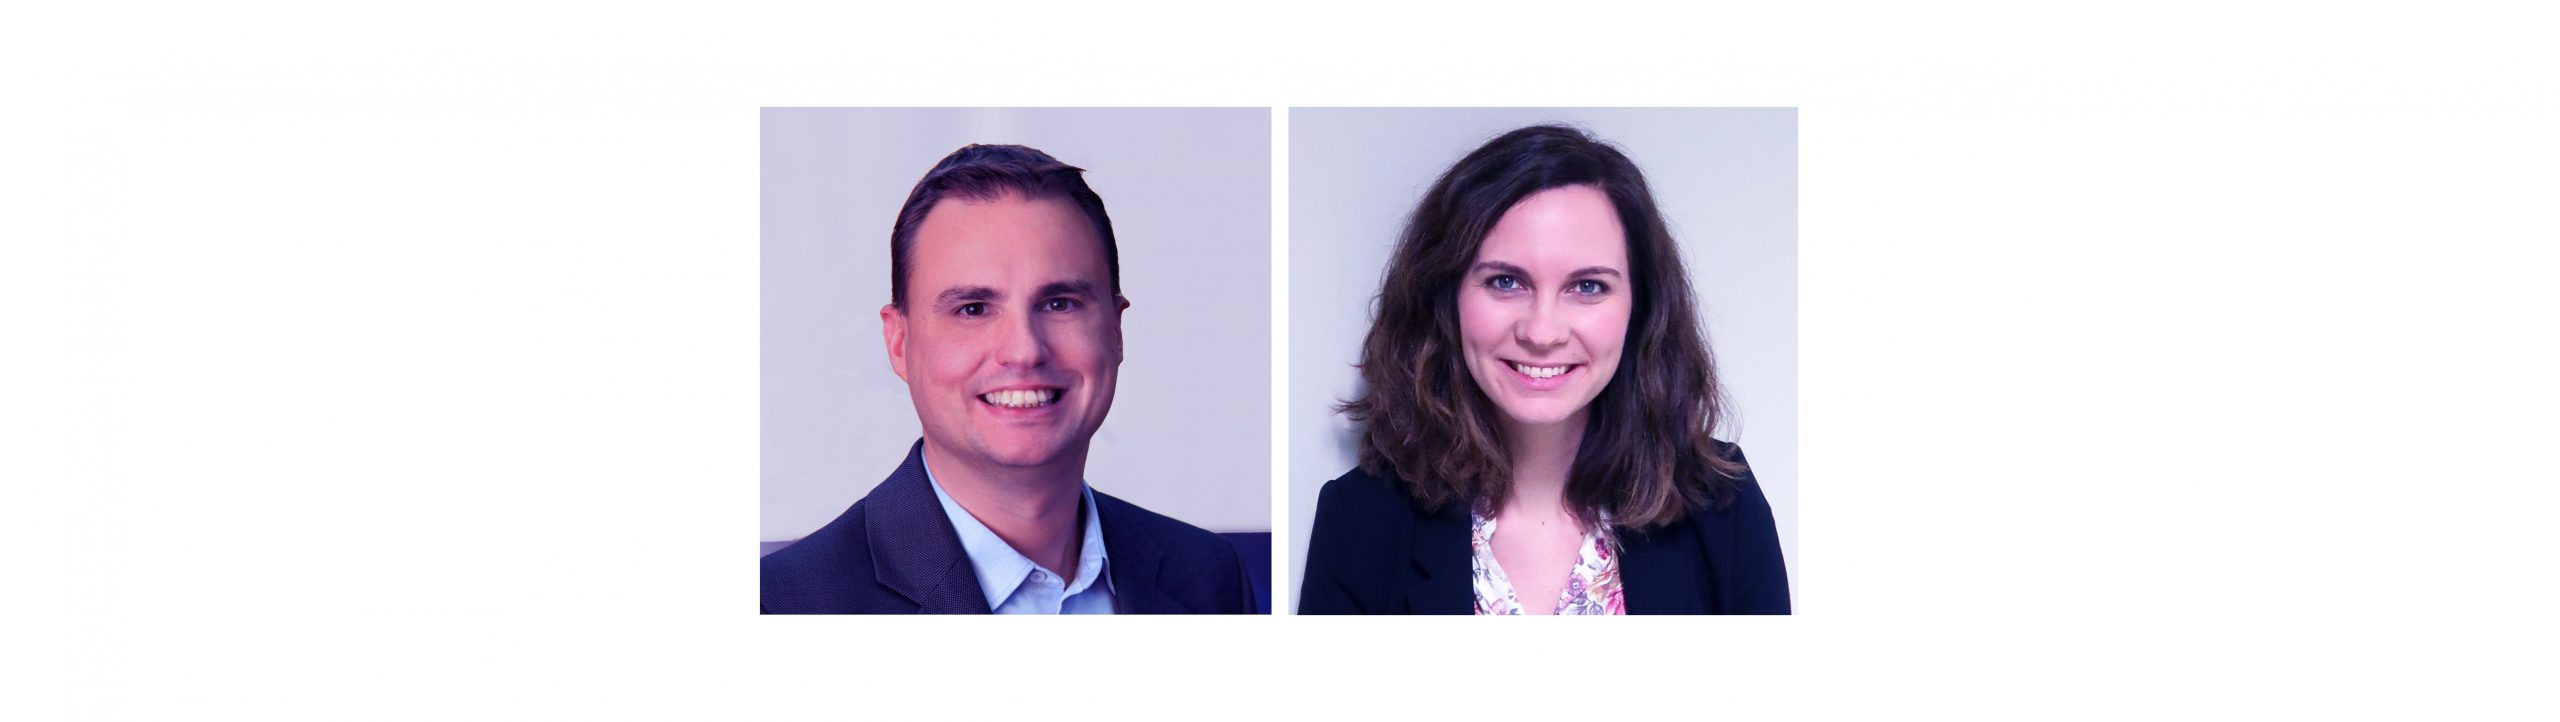 Jens-Martin Loebel und Carolin Hahn